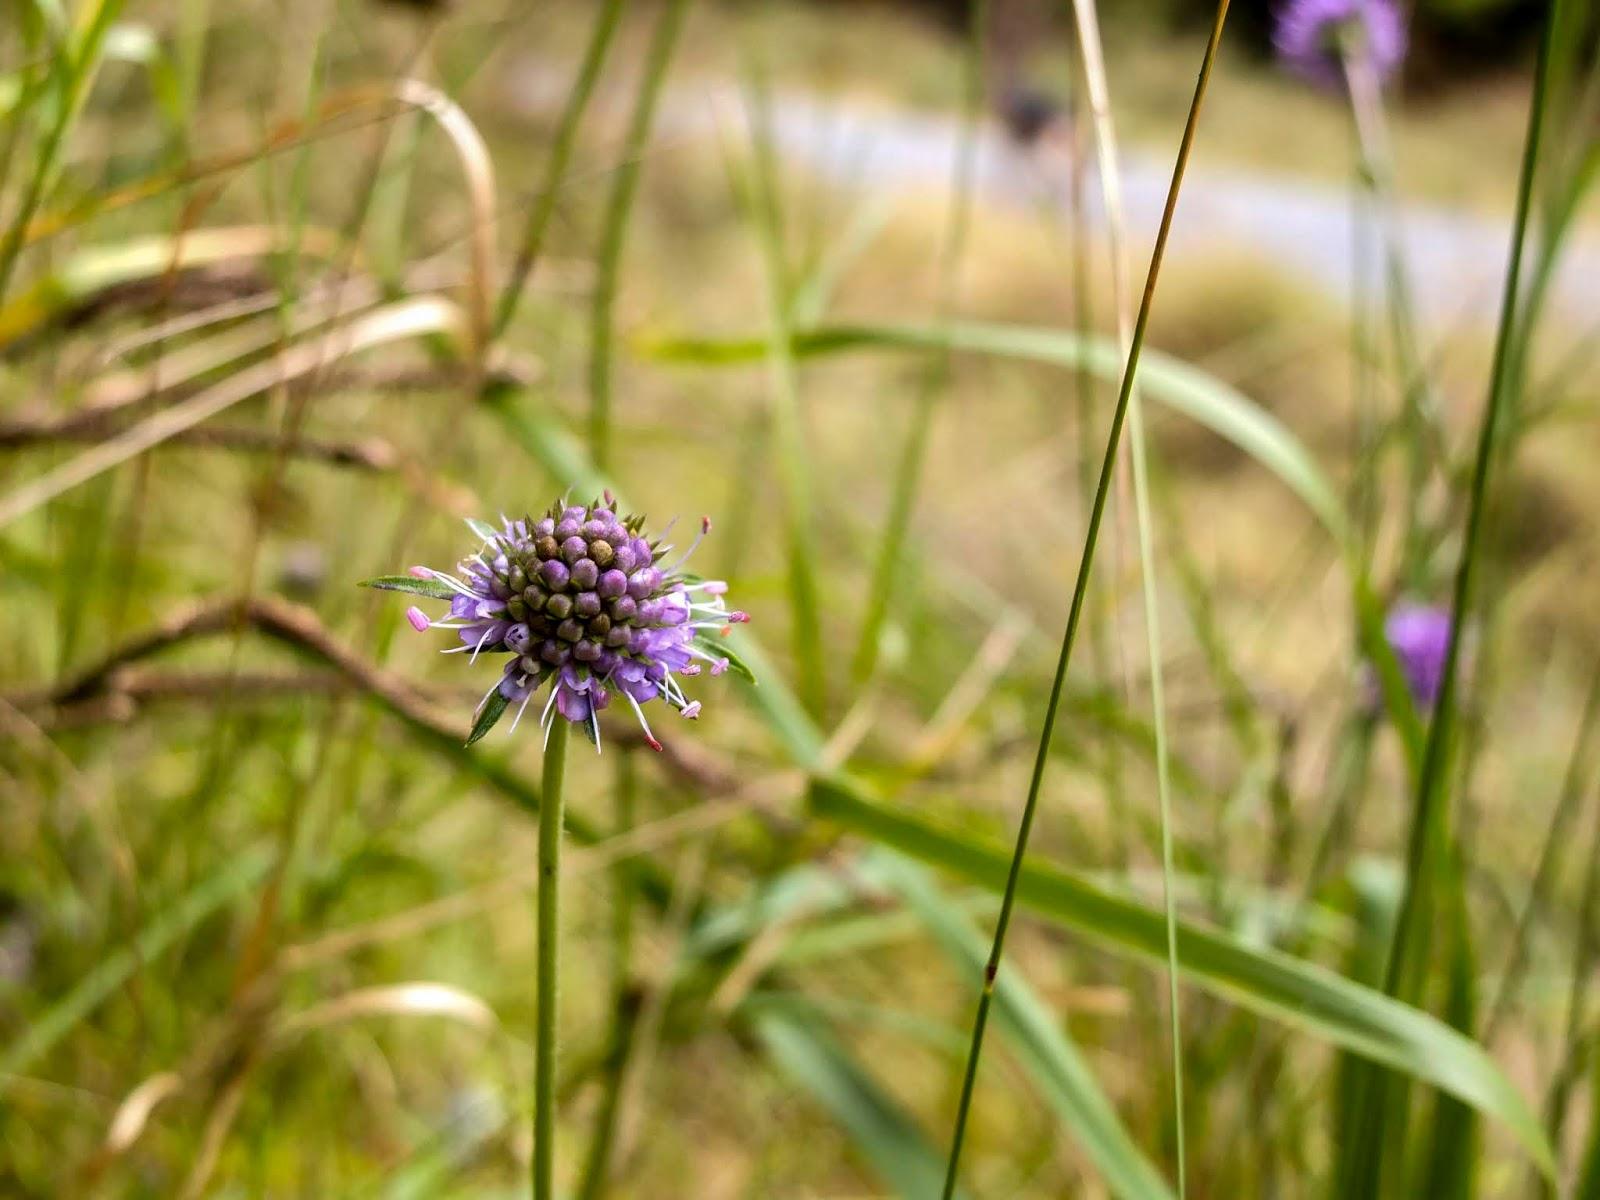 A light purple flower growing along an open path in a forest.